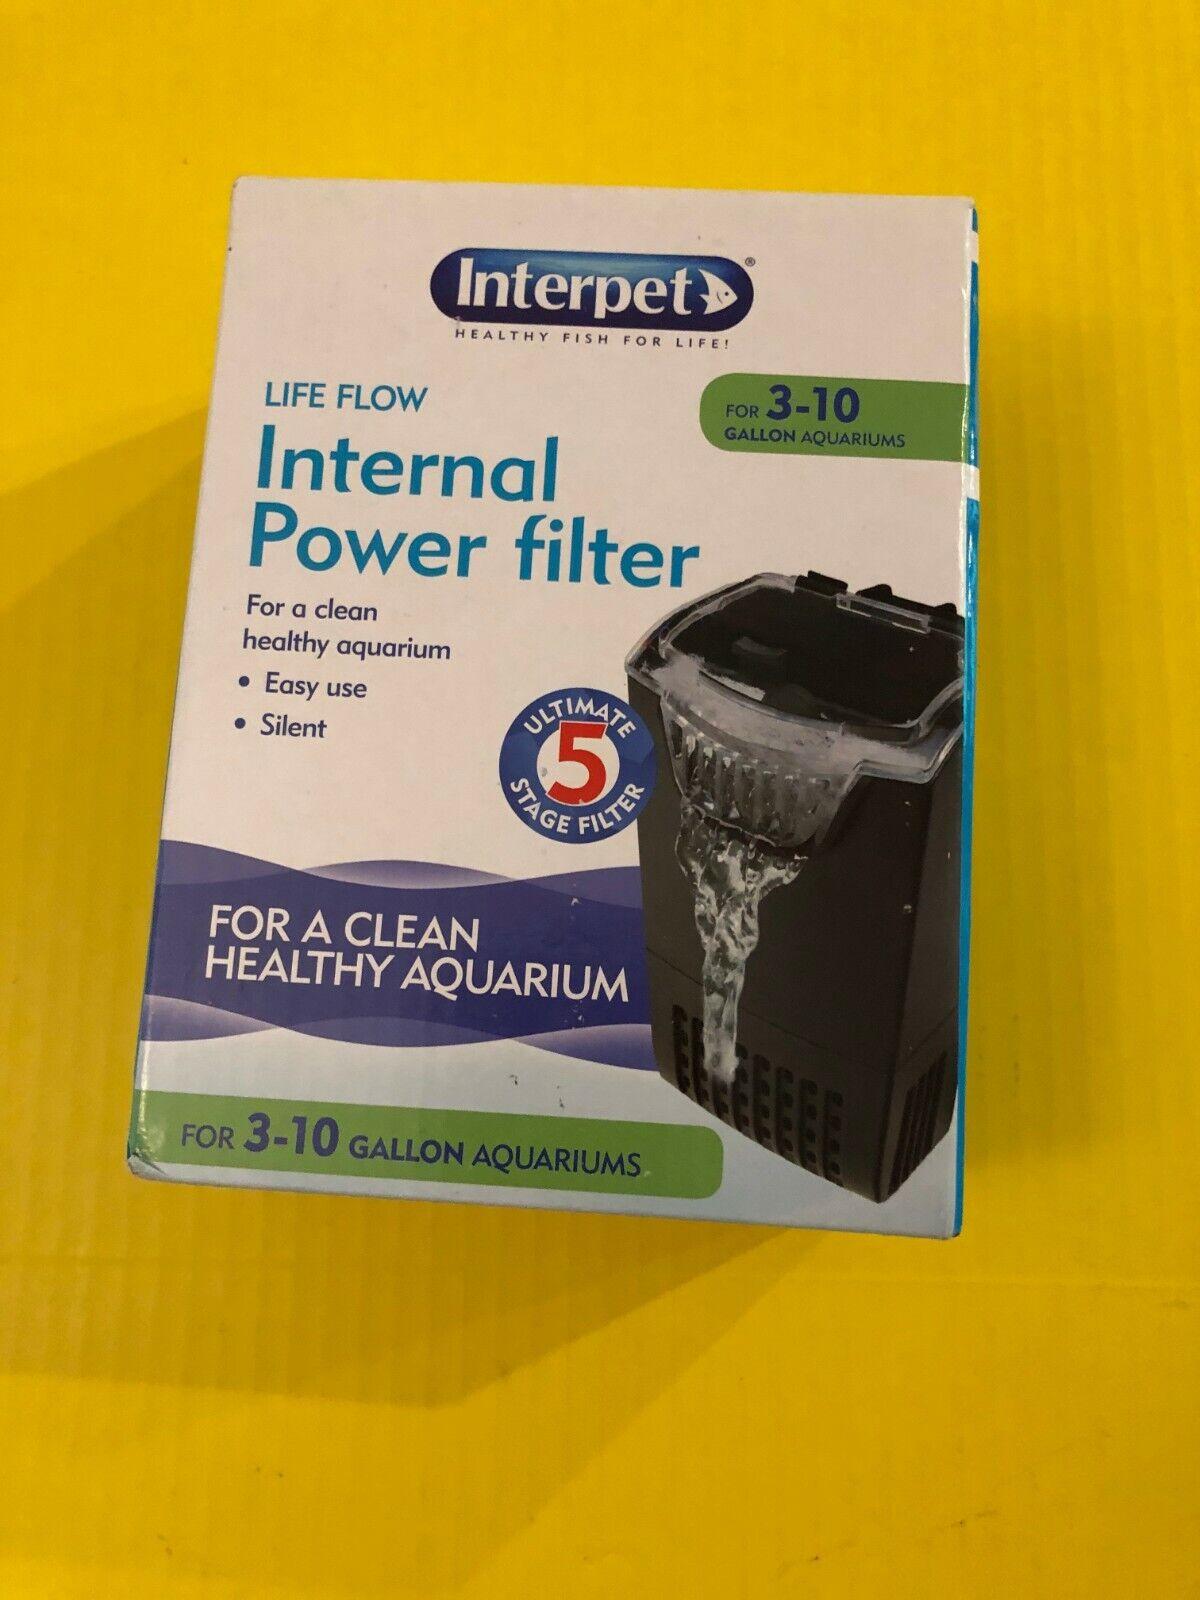 NEW Interpet Life Flow Internal Power Filter for 3 - 10 gall